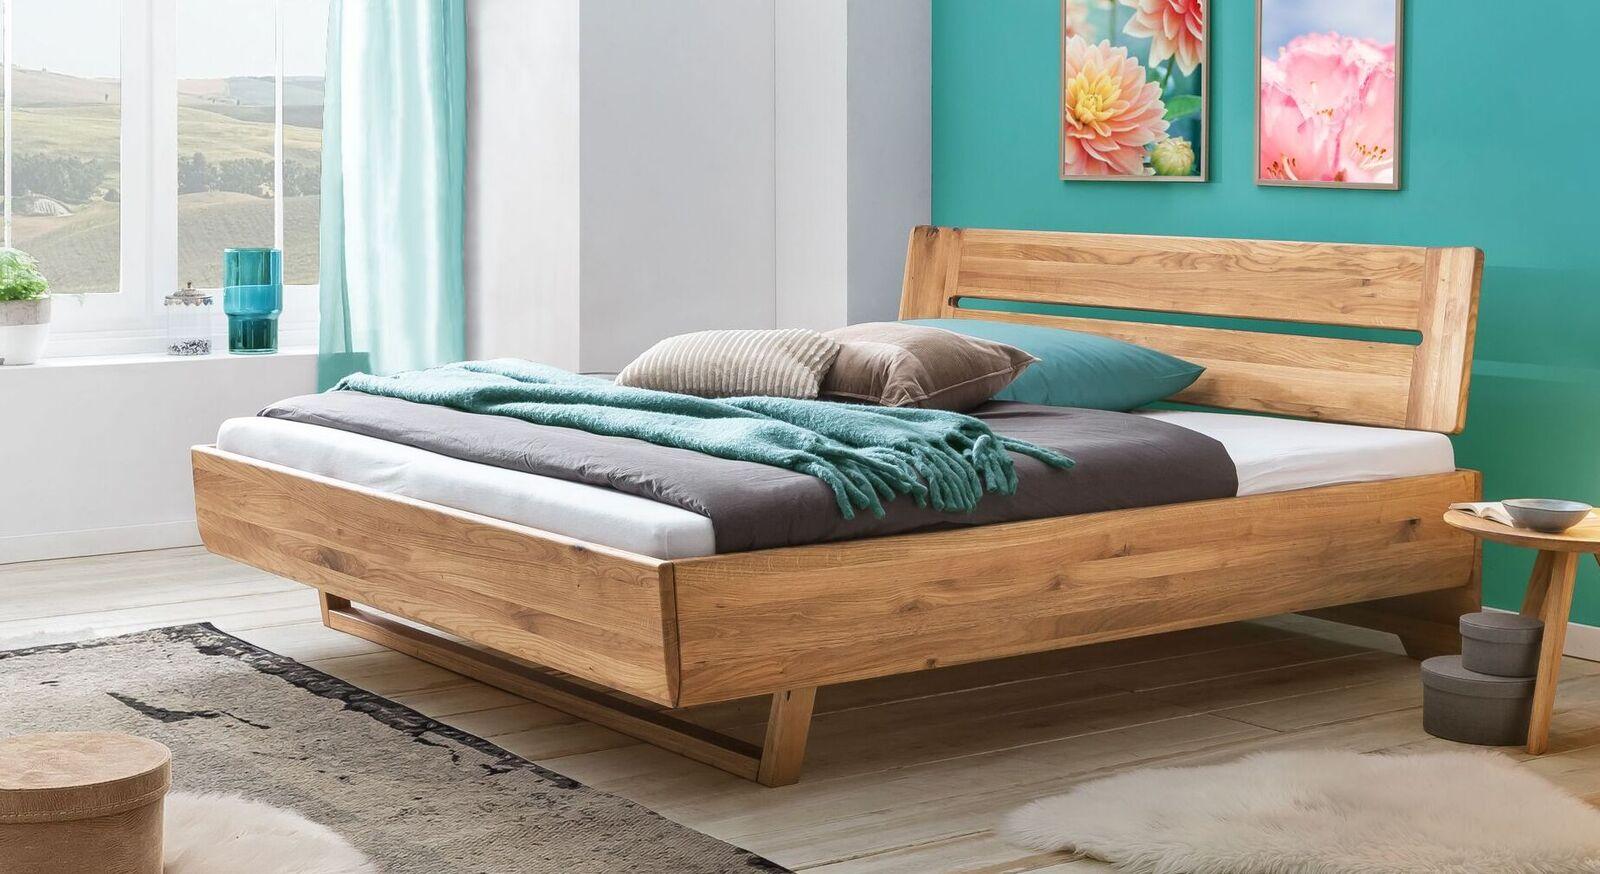 Bett Bekan aus Wildeiche-Massivholz